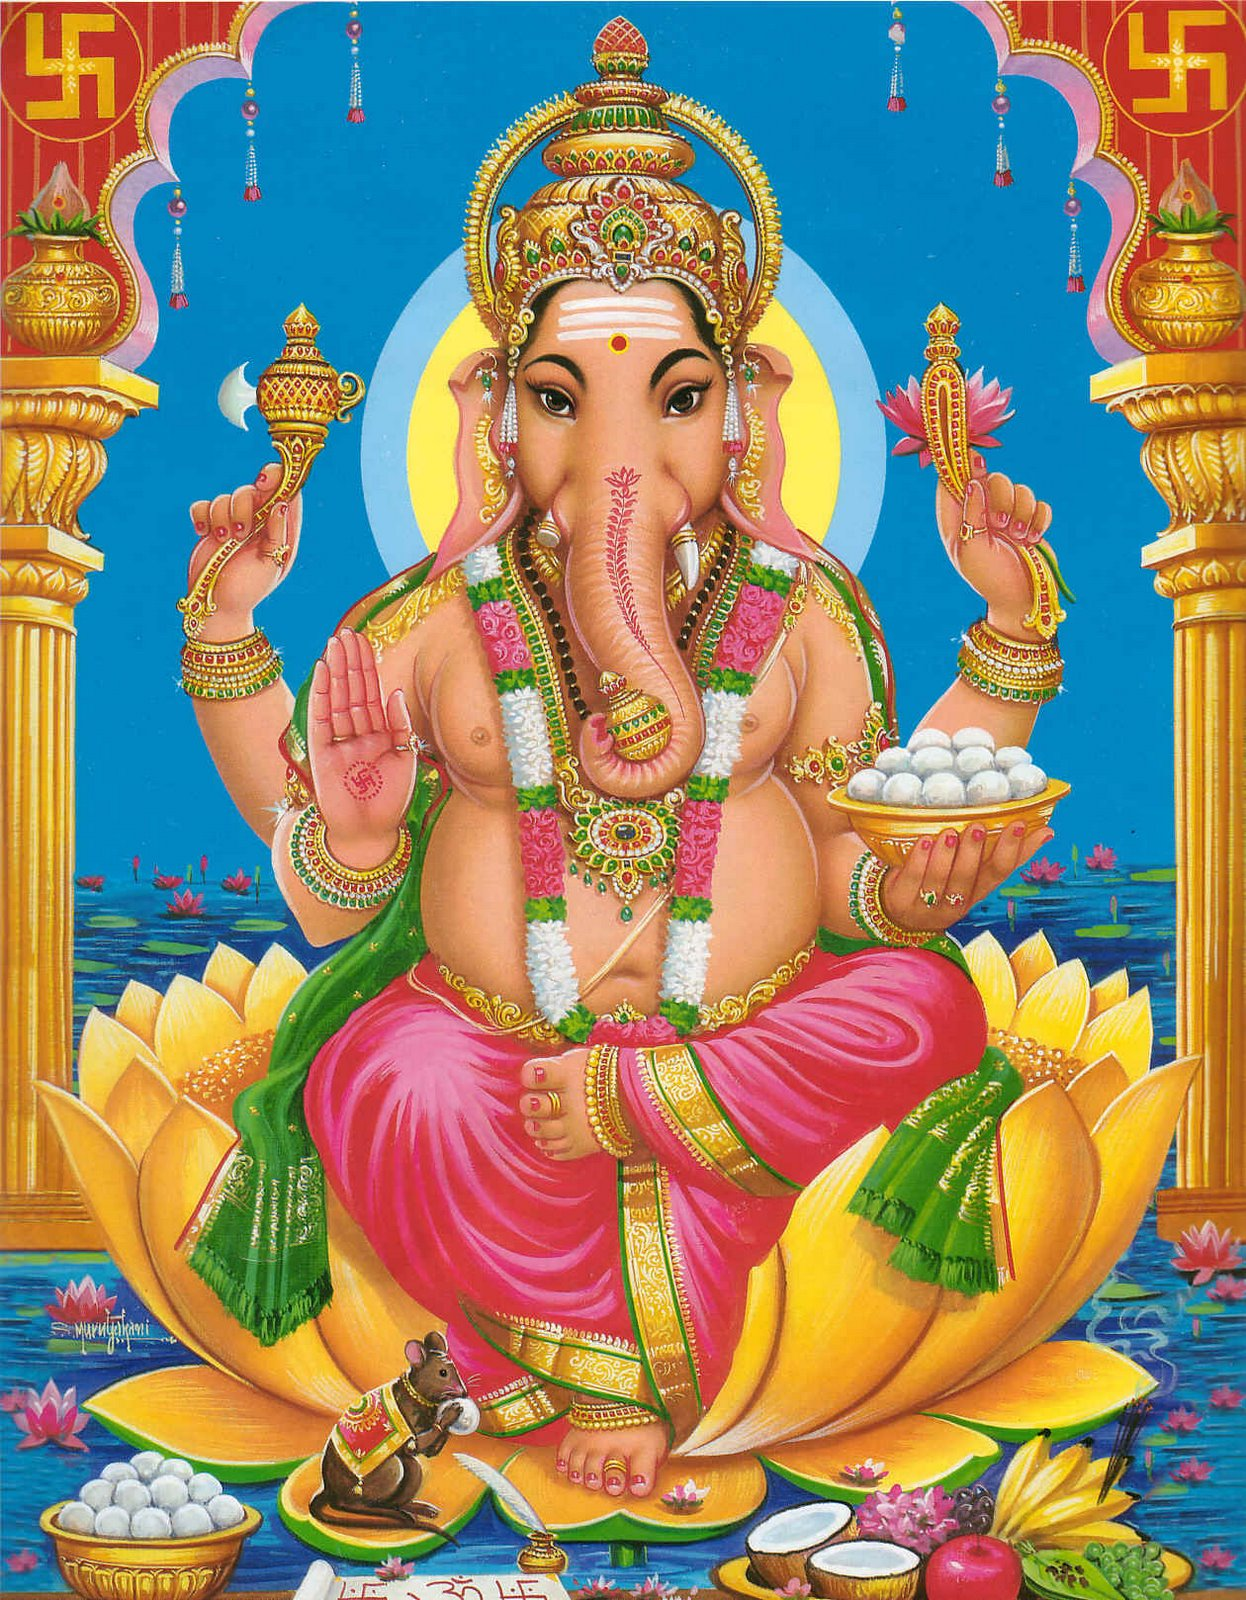 Helpful Tips on Sanatana Dharma / Hindu Principles - 126 (Thoppukaranam, Pillayar Kuttu)